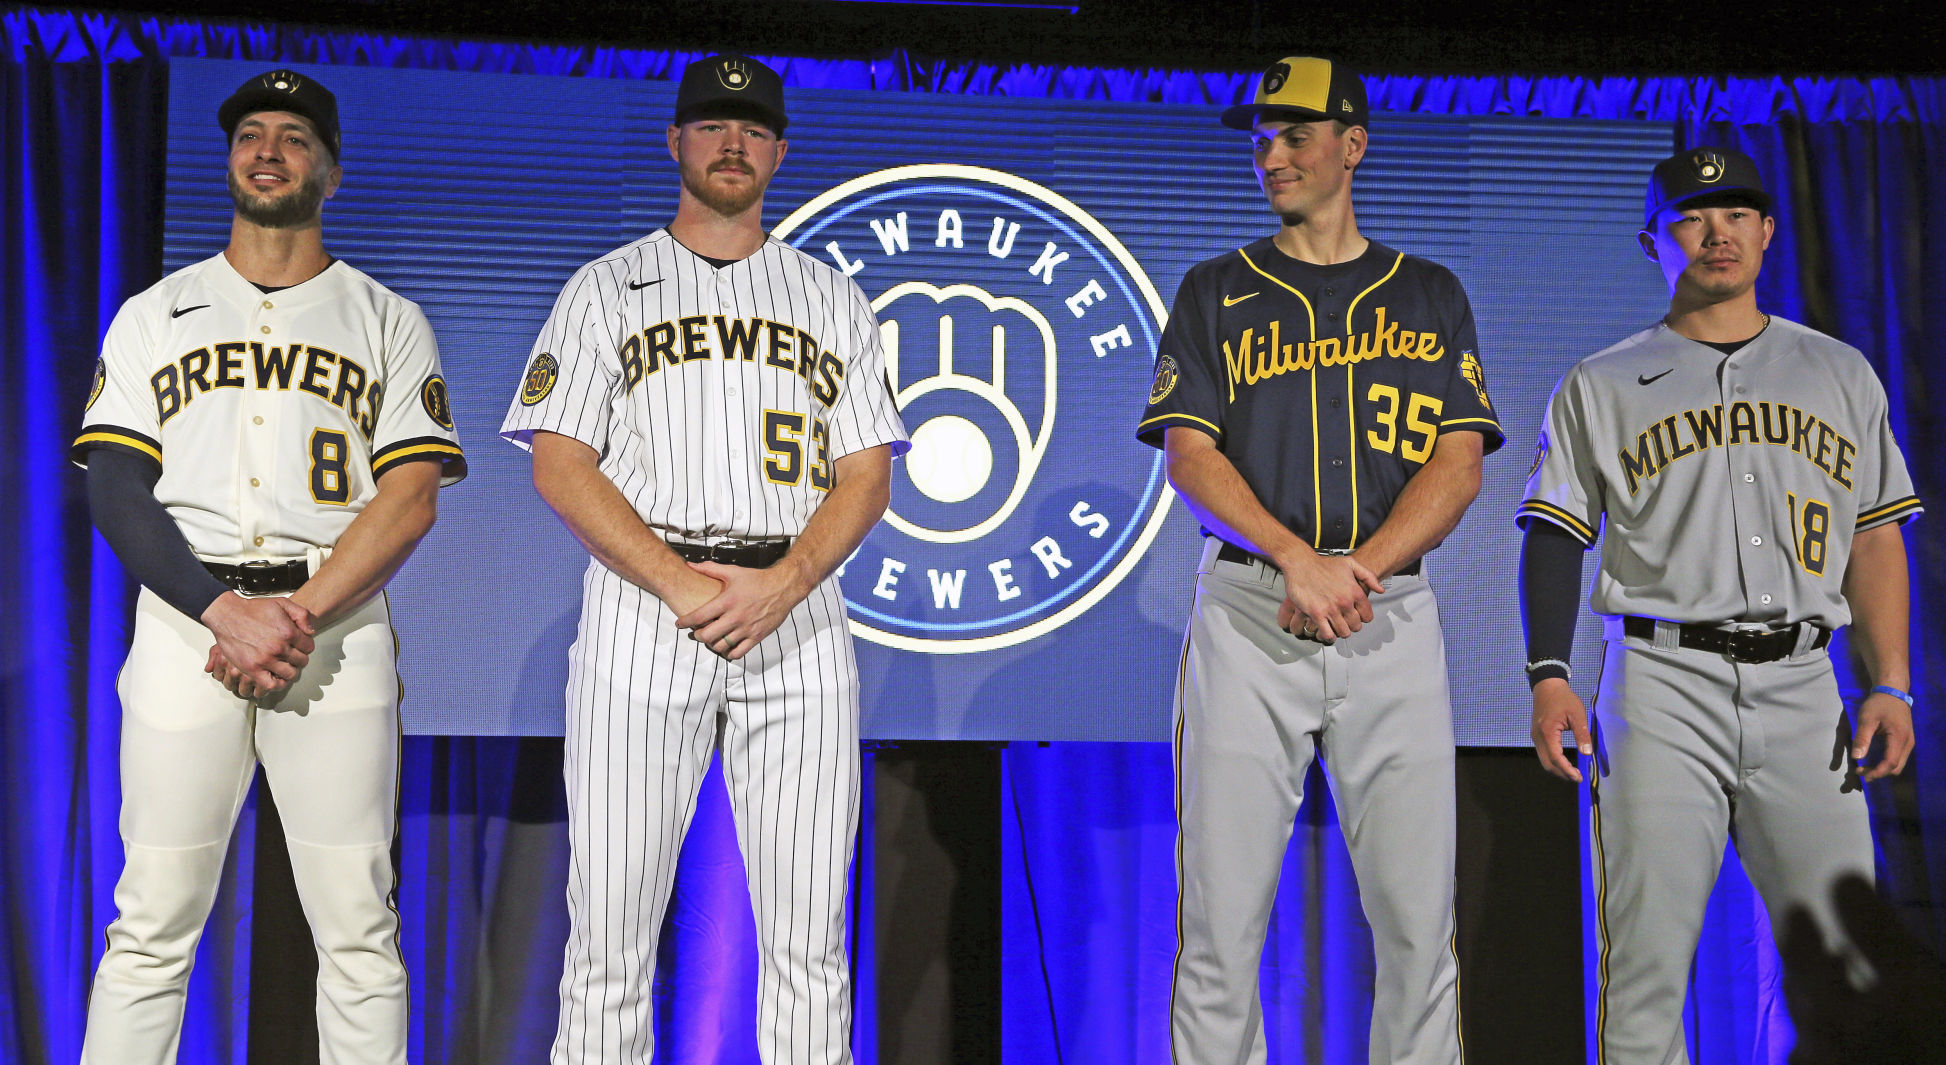 Milwaukee Brewers New Logo Uniform Designs Revealed Lacrossetribune Com